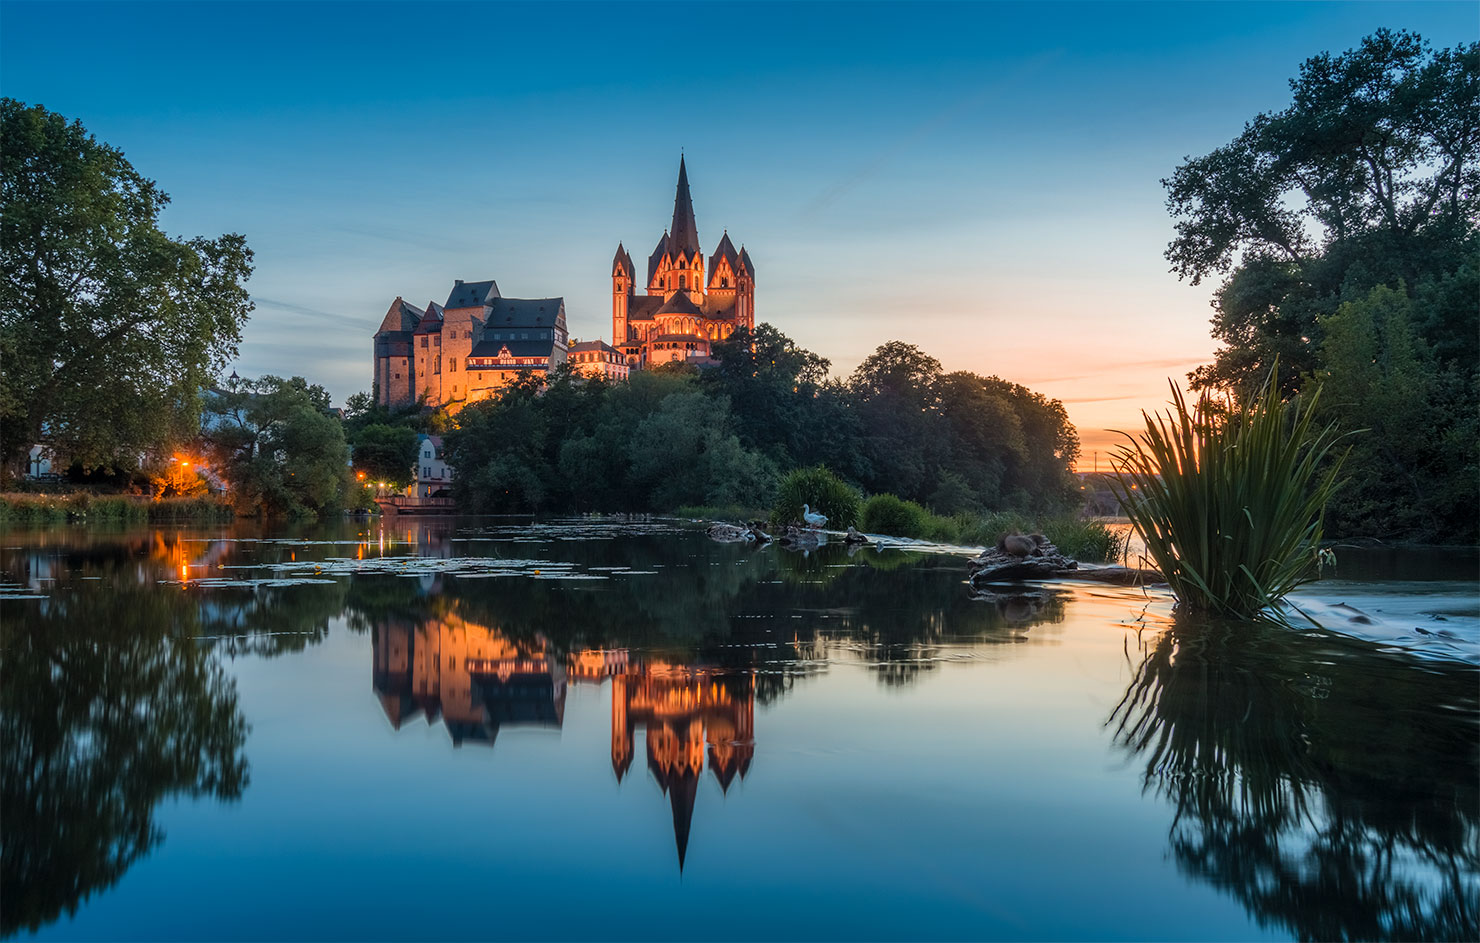 Limburg Lahn Blick auf Dom aus Lahn im Sommer